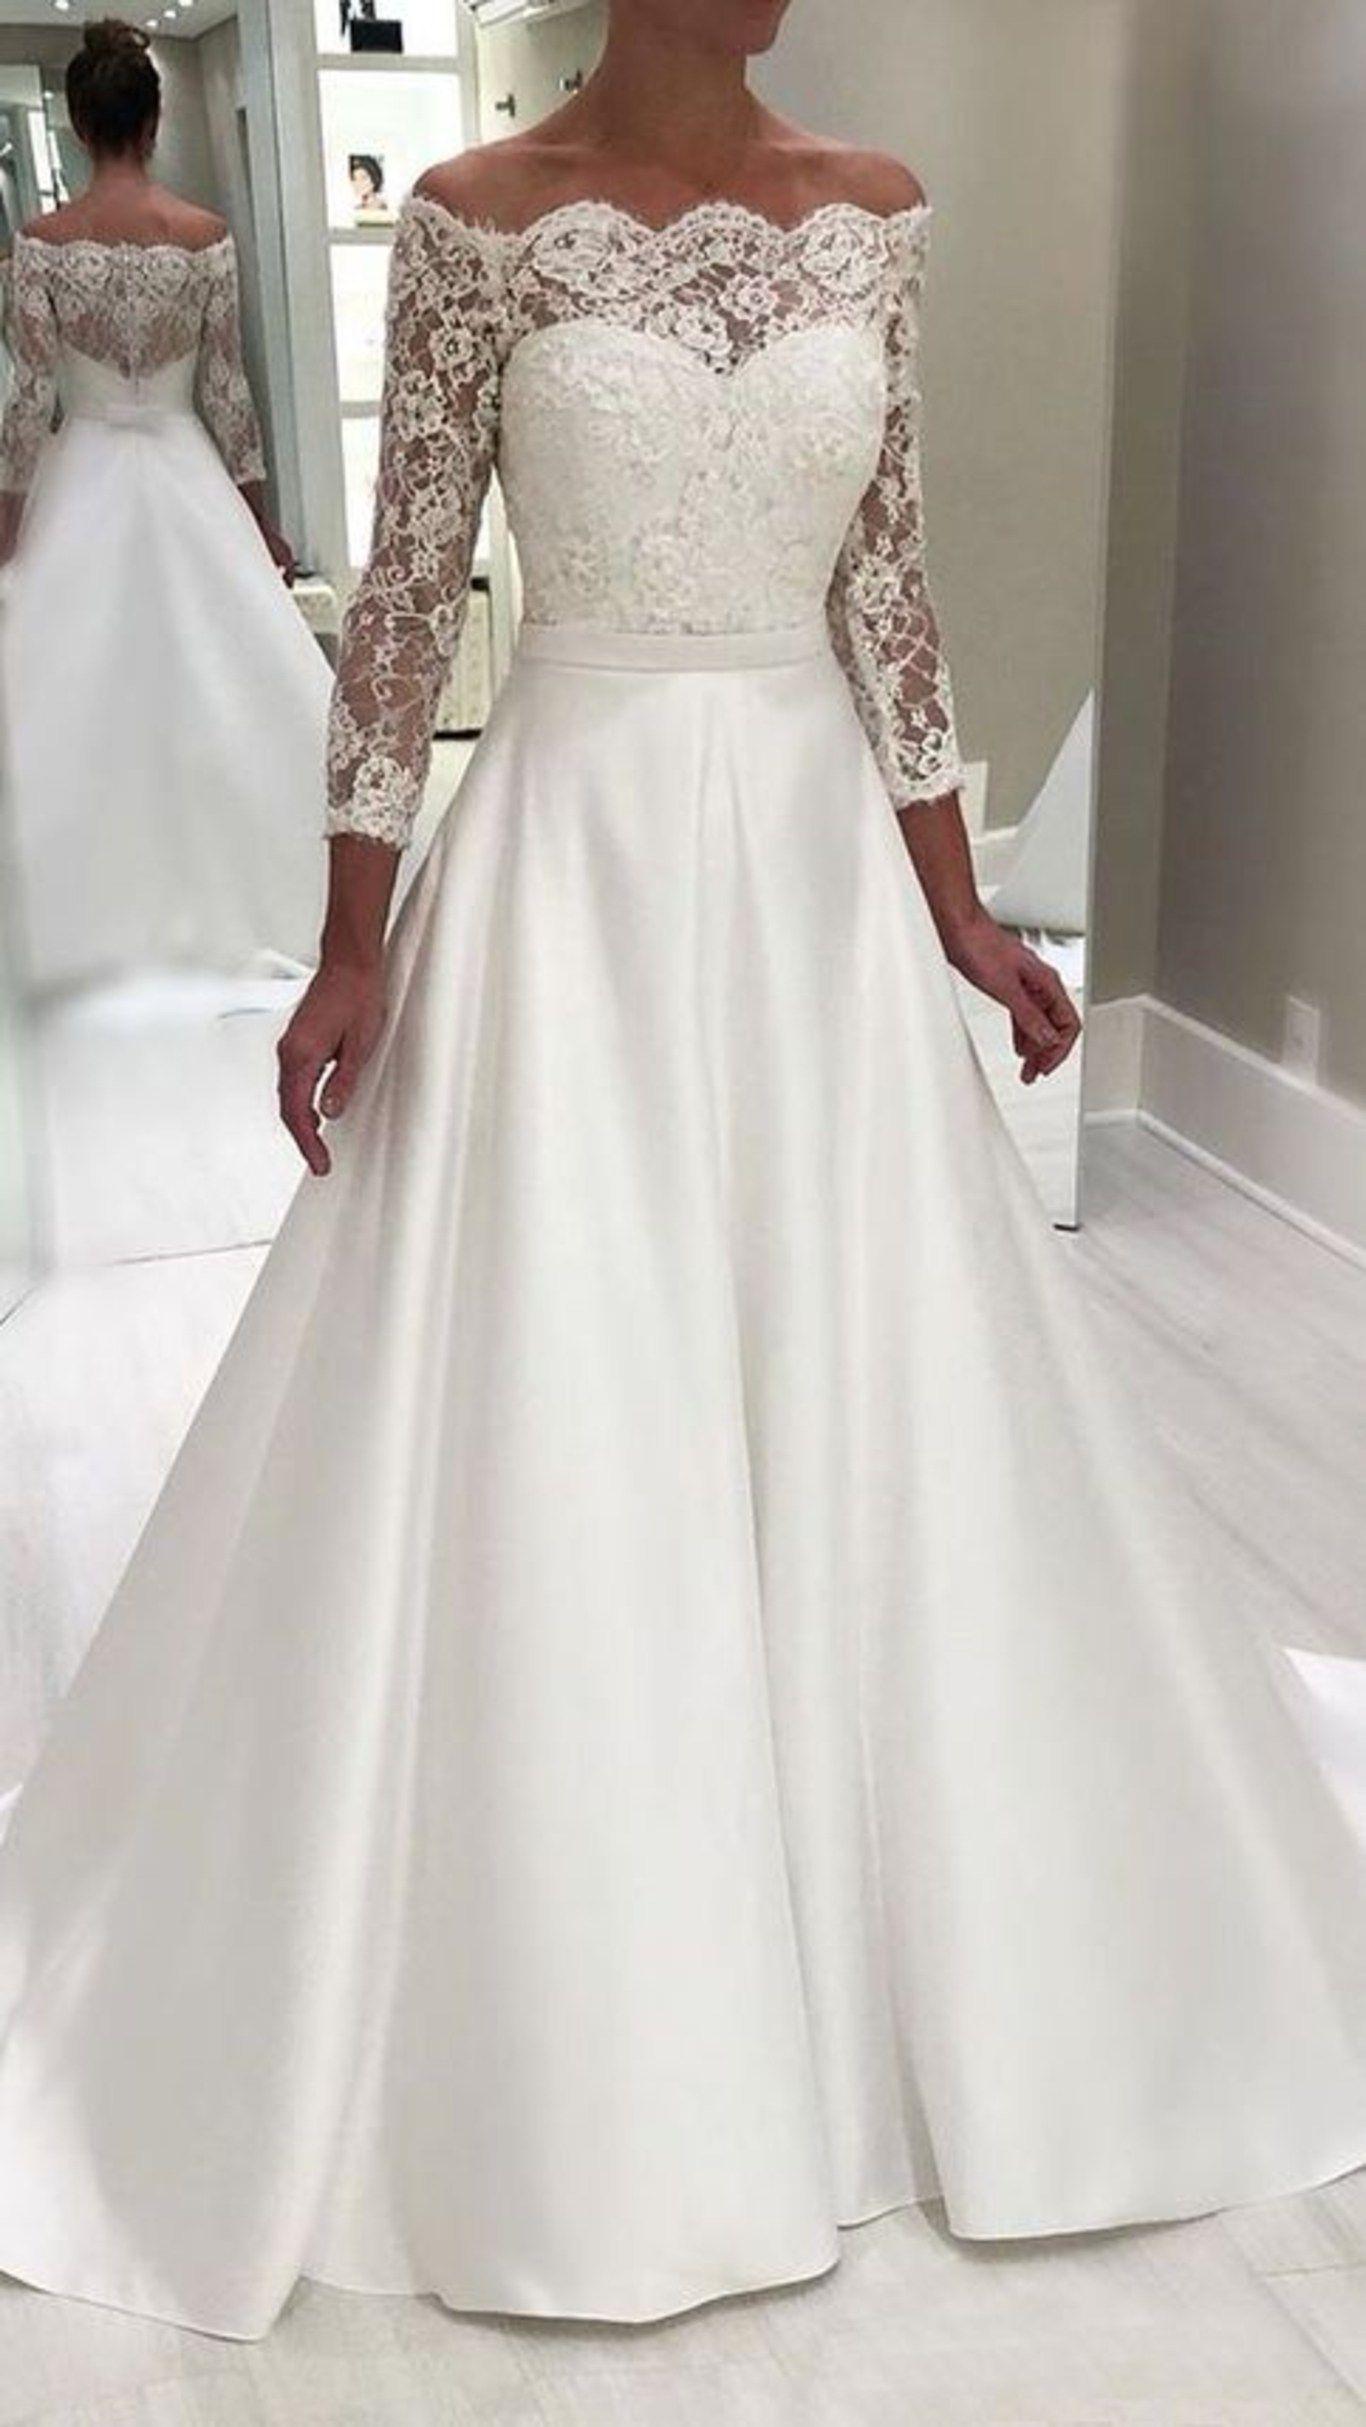 Sgd202 Elegant Long Sleeve Wedding Dresses Simple Satin Bridal Dress In 2020 Elegant Long Sleeve Wedding Dresses Wedding Dresses Simple Ball Gowns Wedding,Plus Size Dresses For Wedding Guest Summer